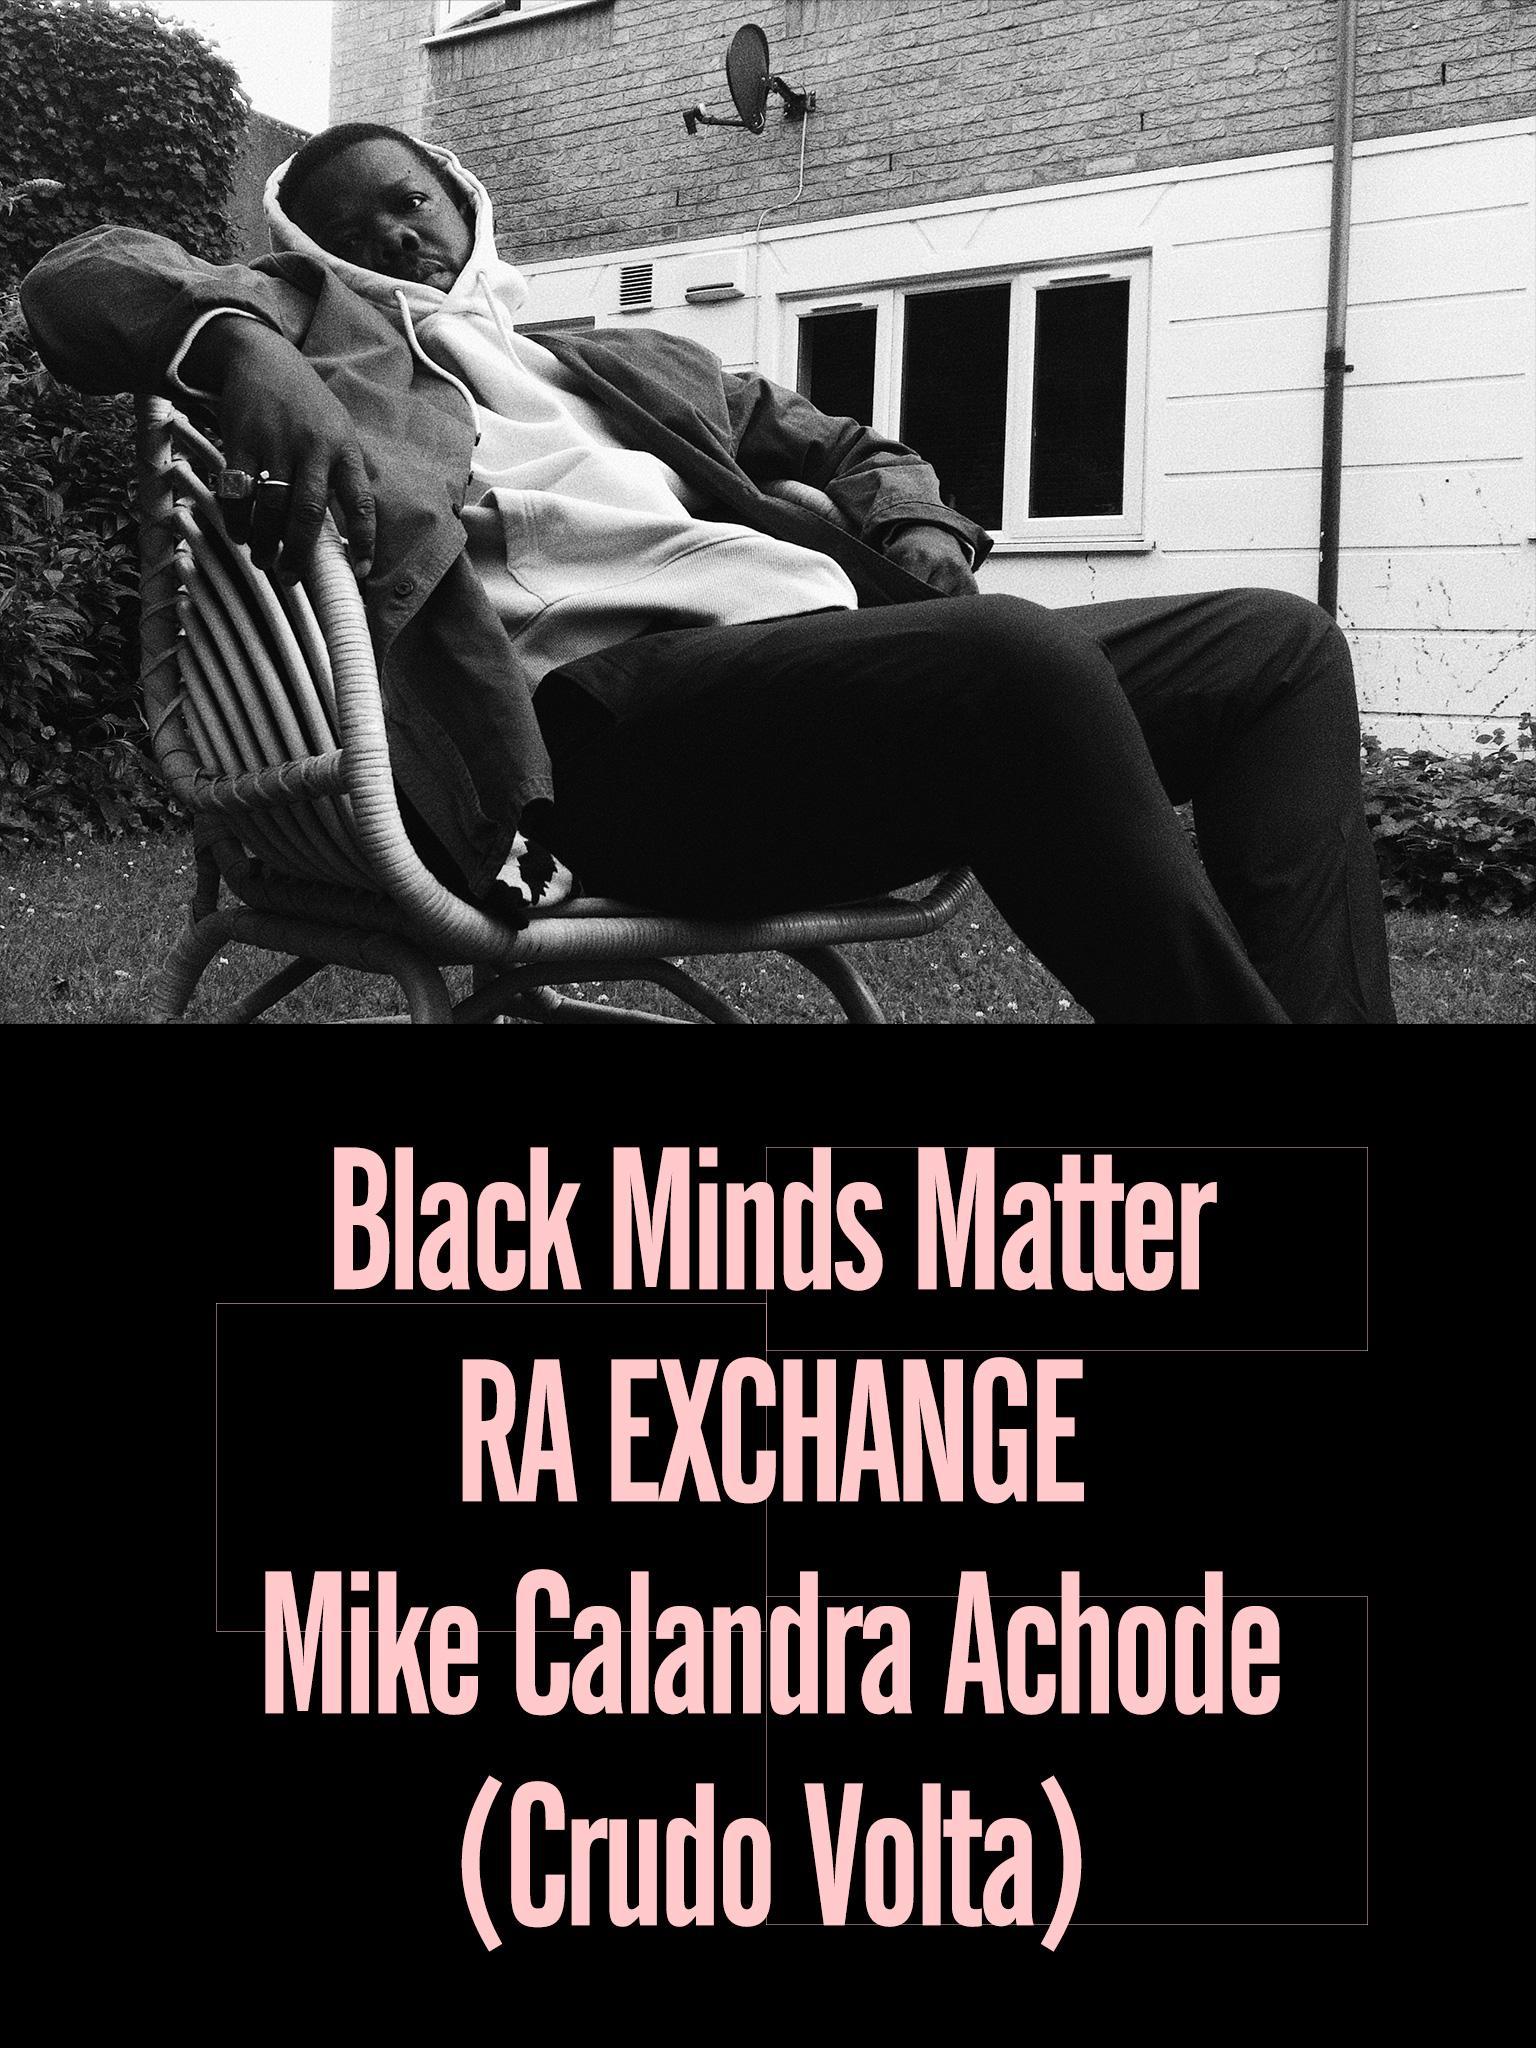 Black Minds Matter UK x RA Exchange: Mike Calandra Achode (Crudo Volta, Python Syndicate)